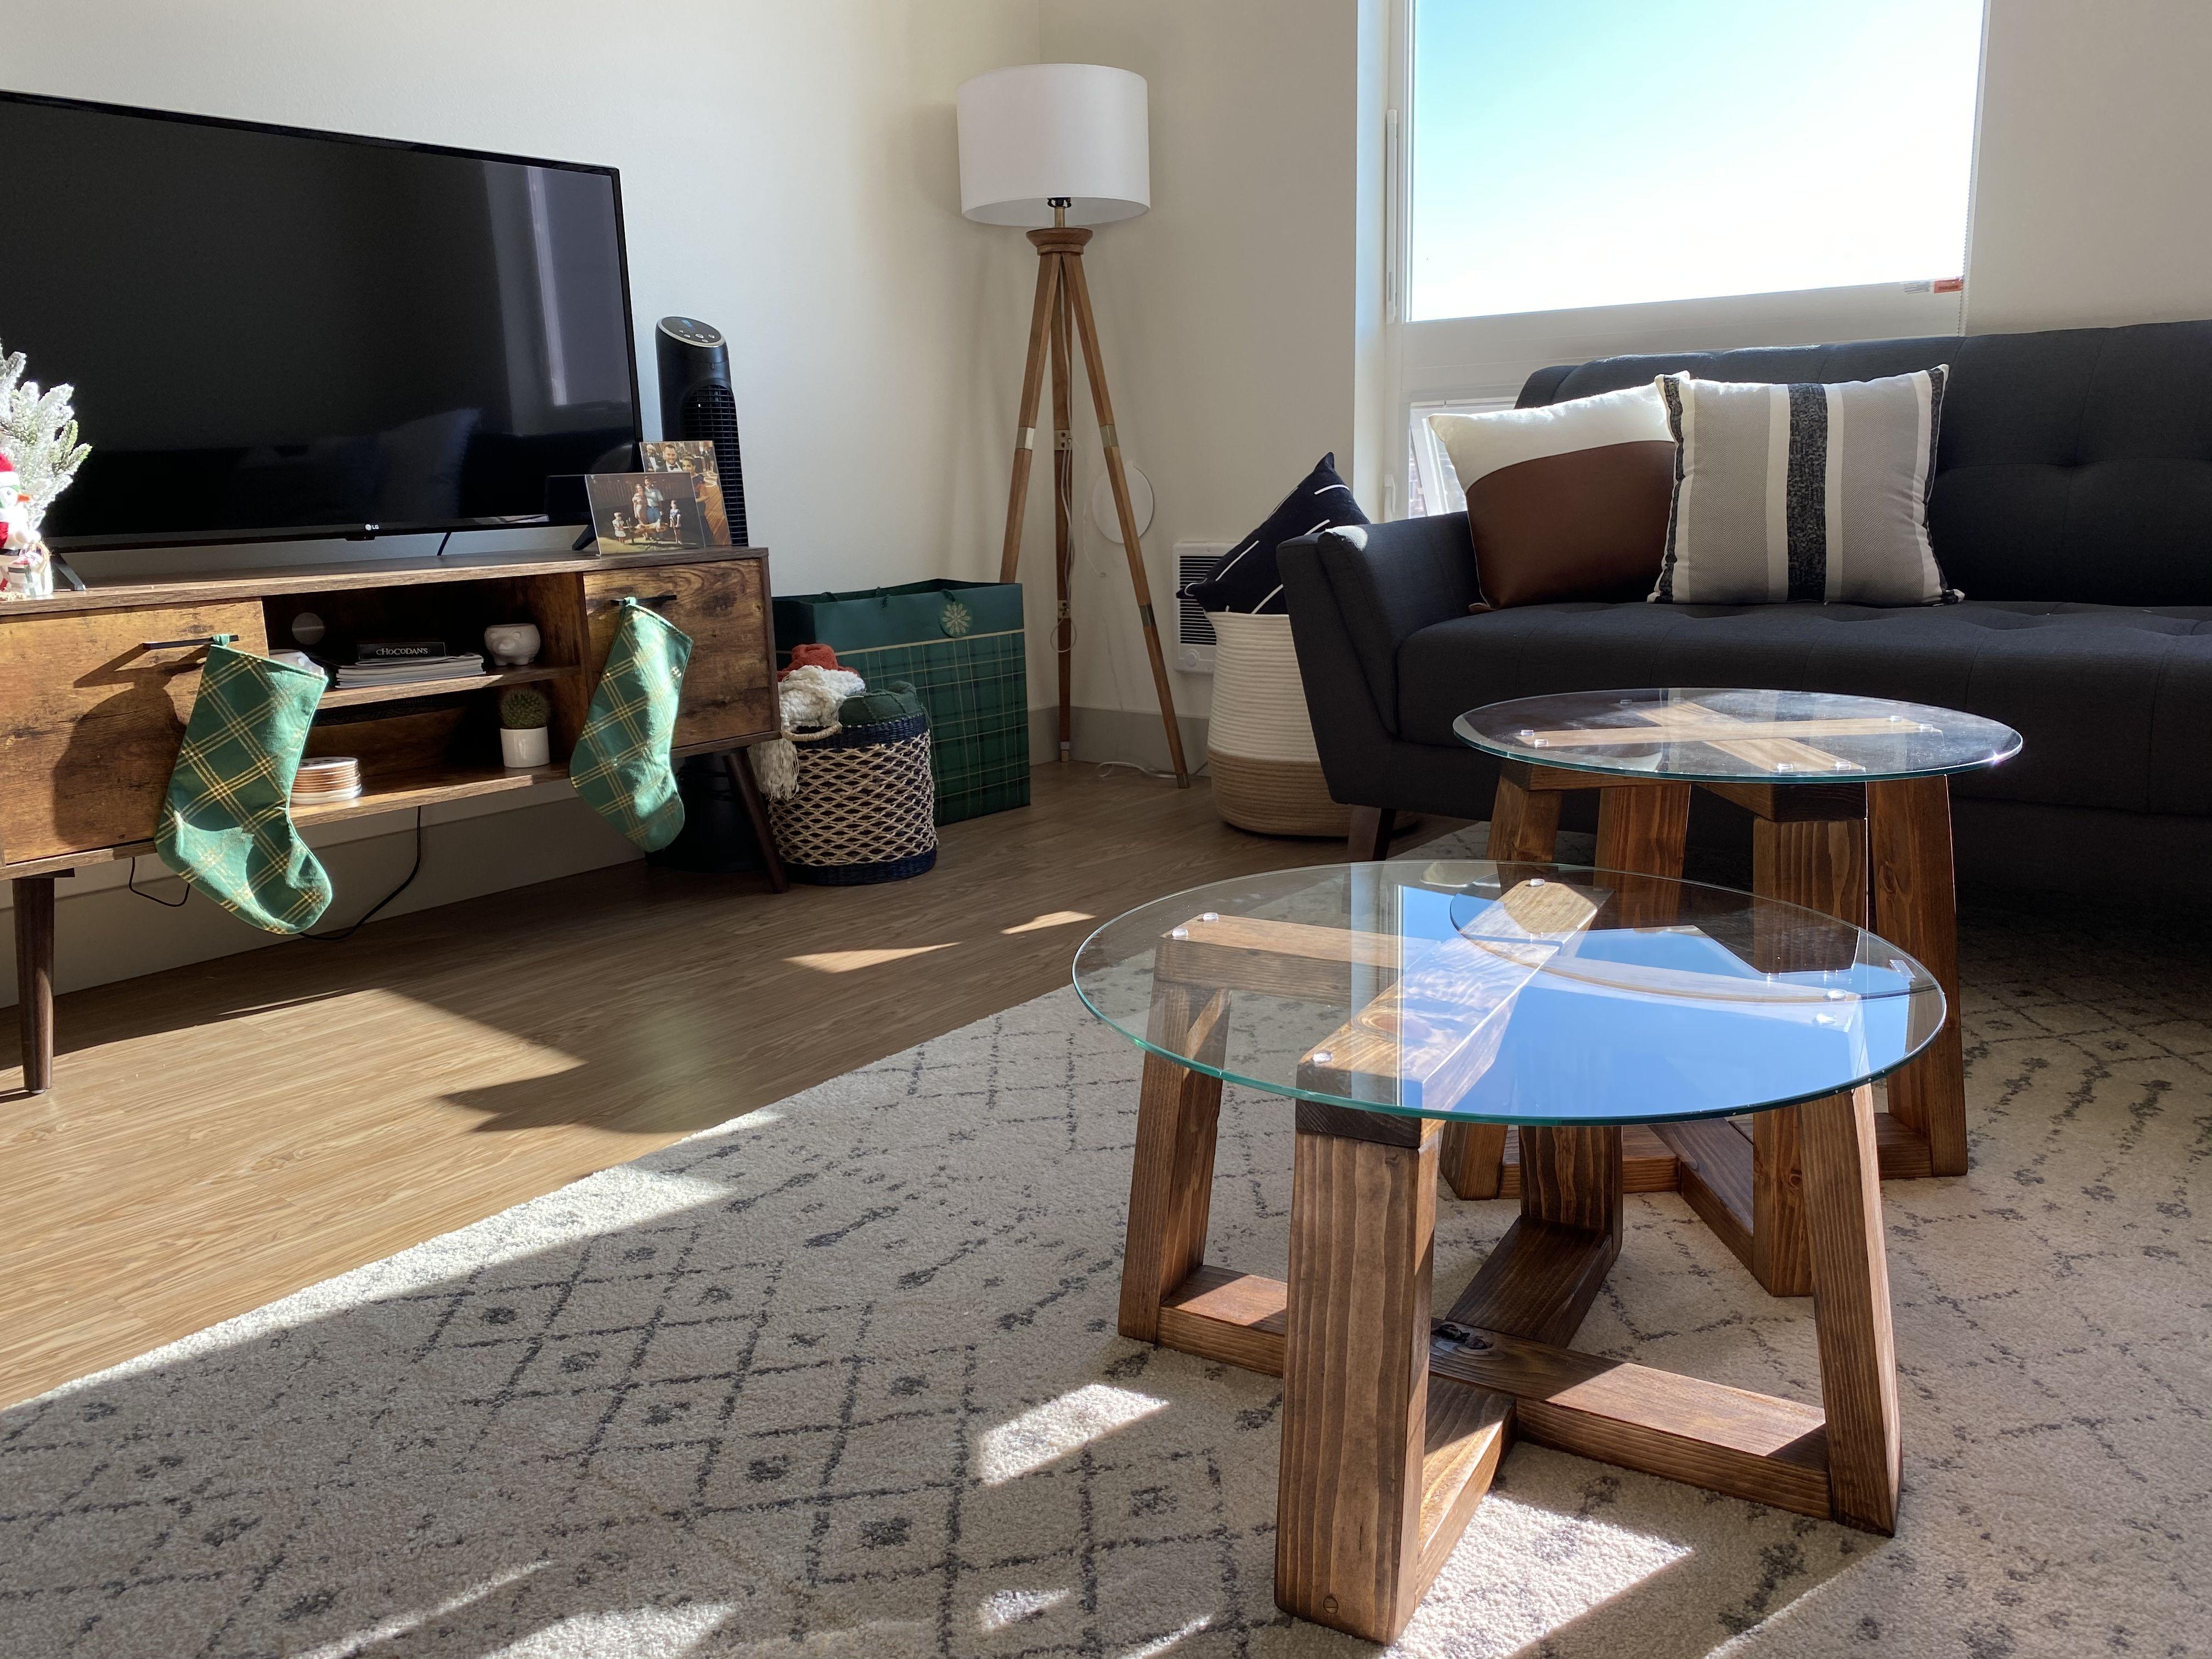 Glass Coffee Table Duo Ians Furniture Coffee Table Table Glass Coffee Table [ 3024 x 4032 Pixel ]